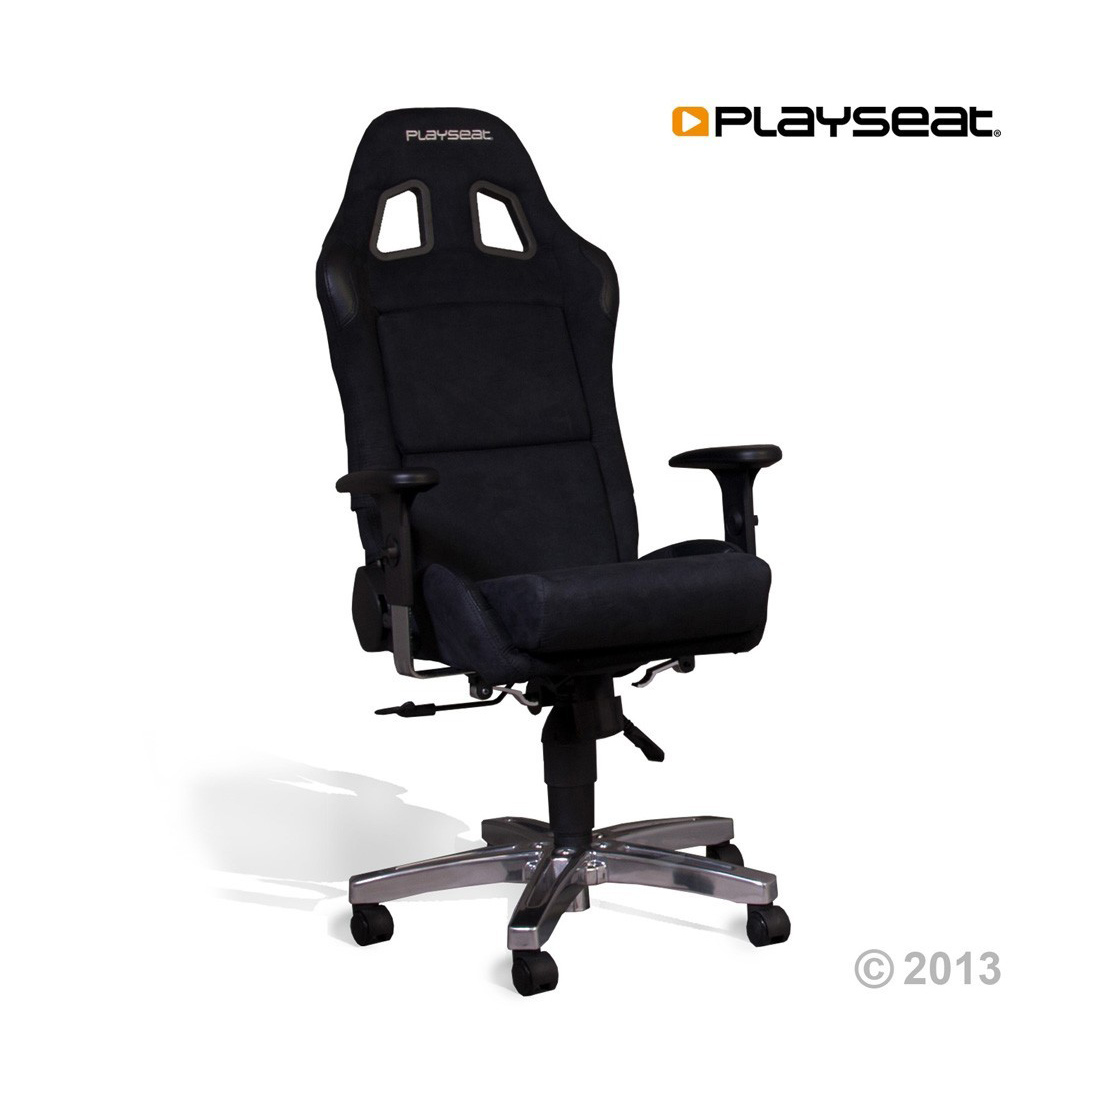 best gaming chair brands threaded glides playseat office racing seat alcantara gsm sport seats